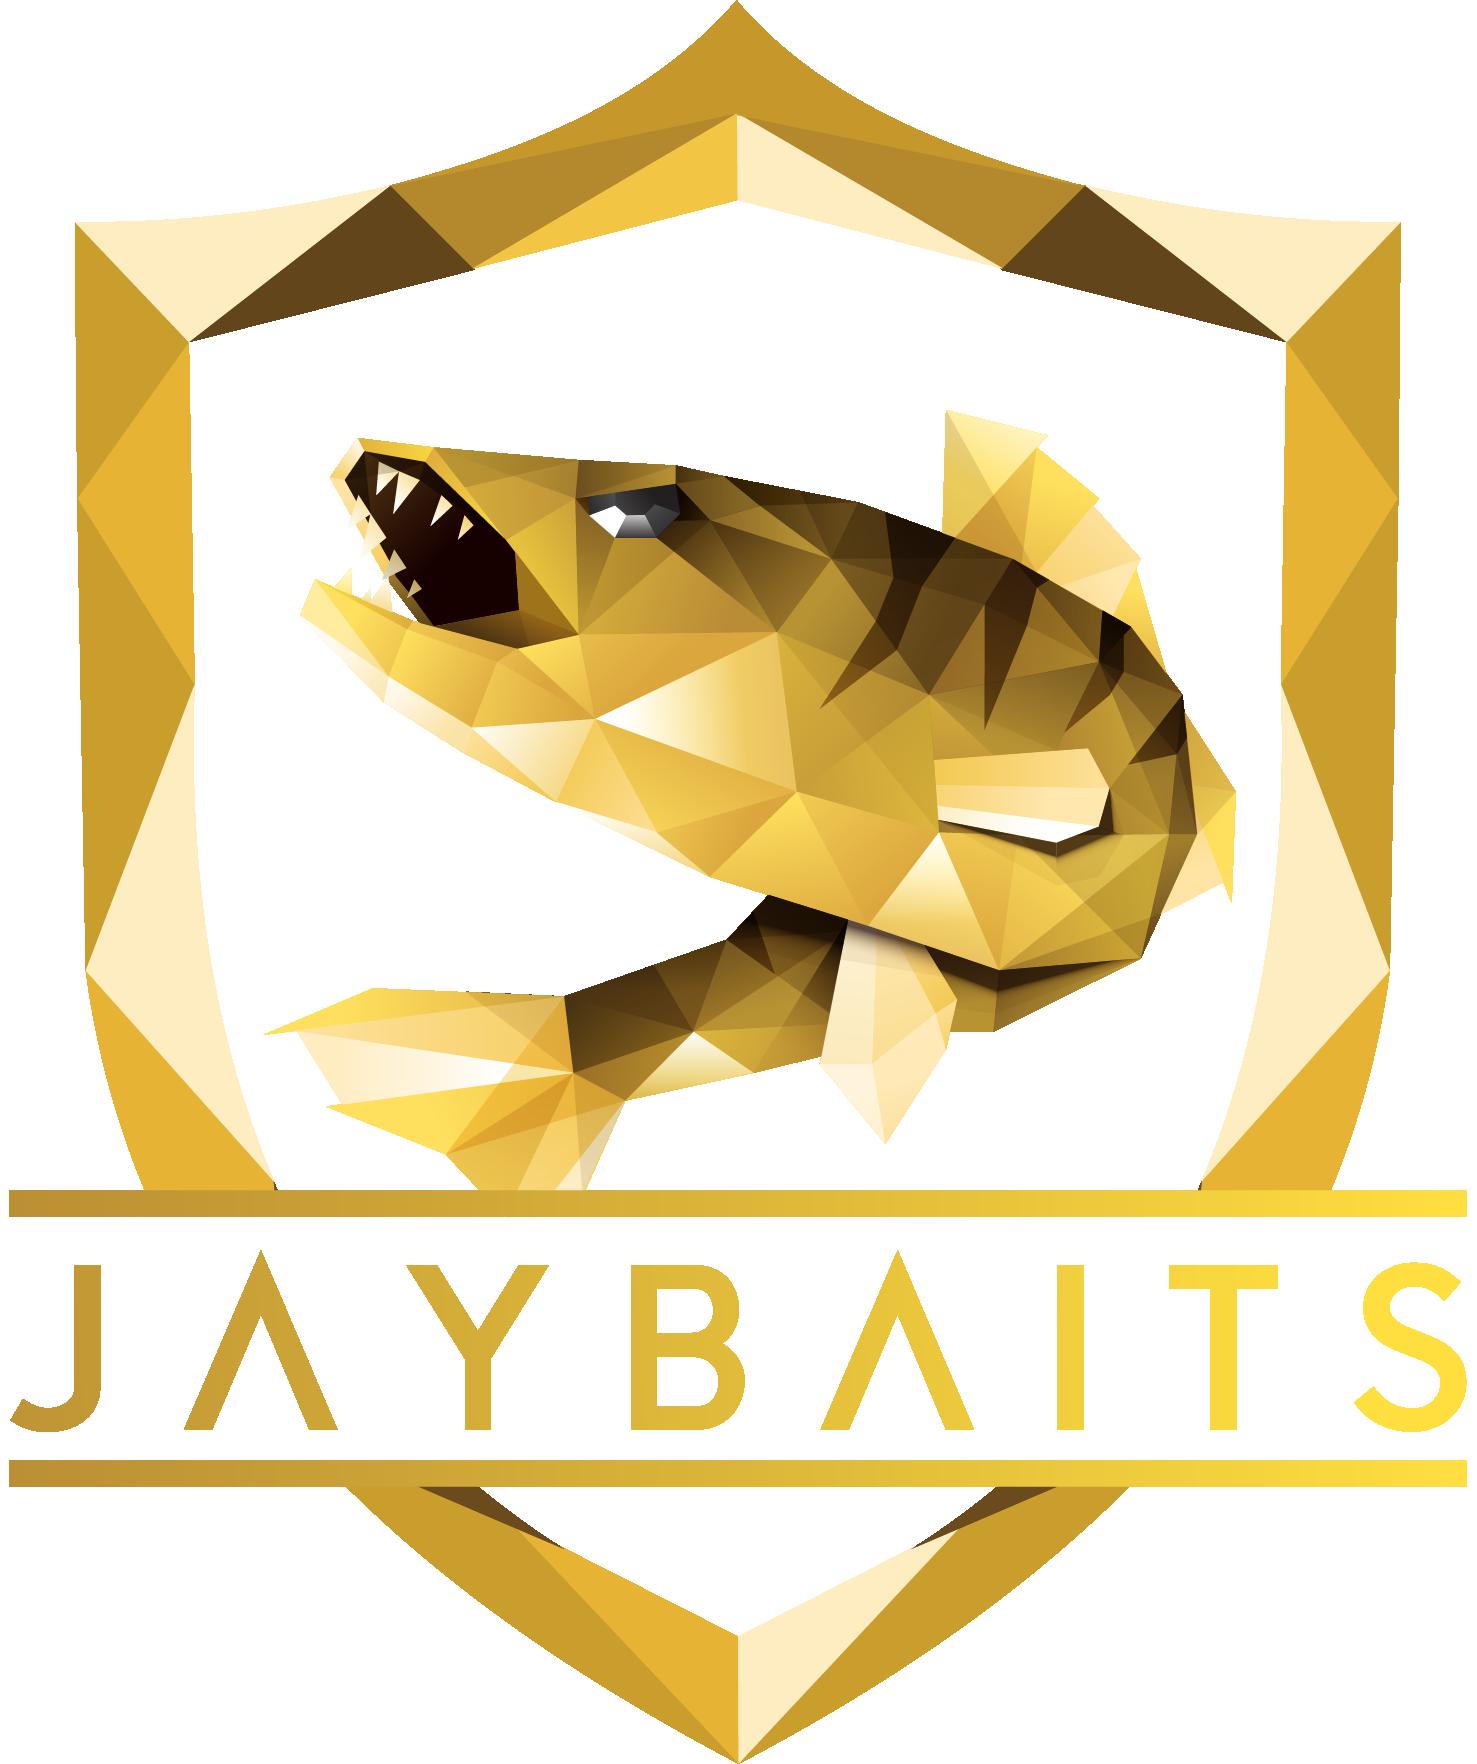 JayBaits